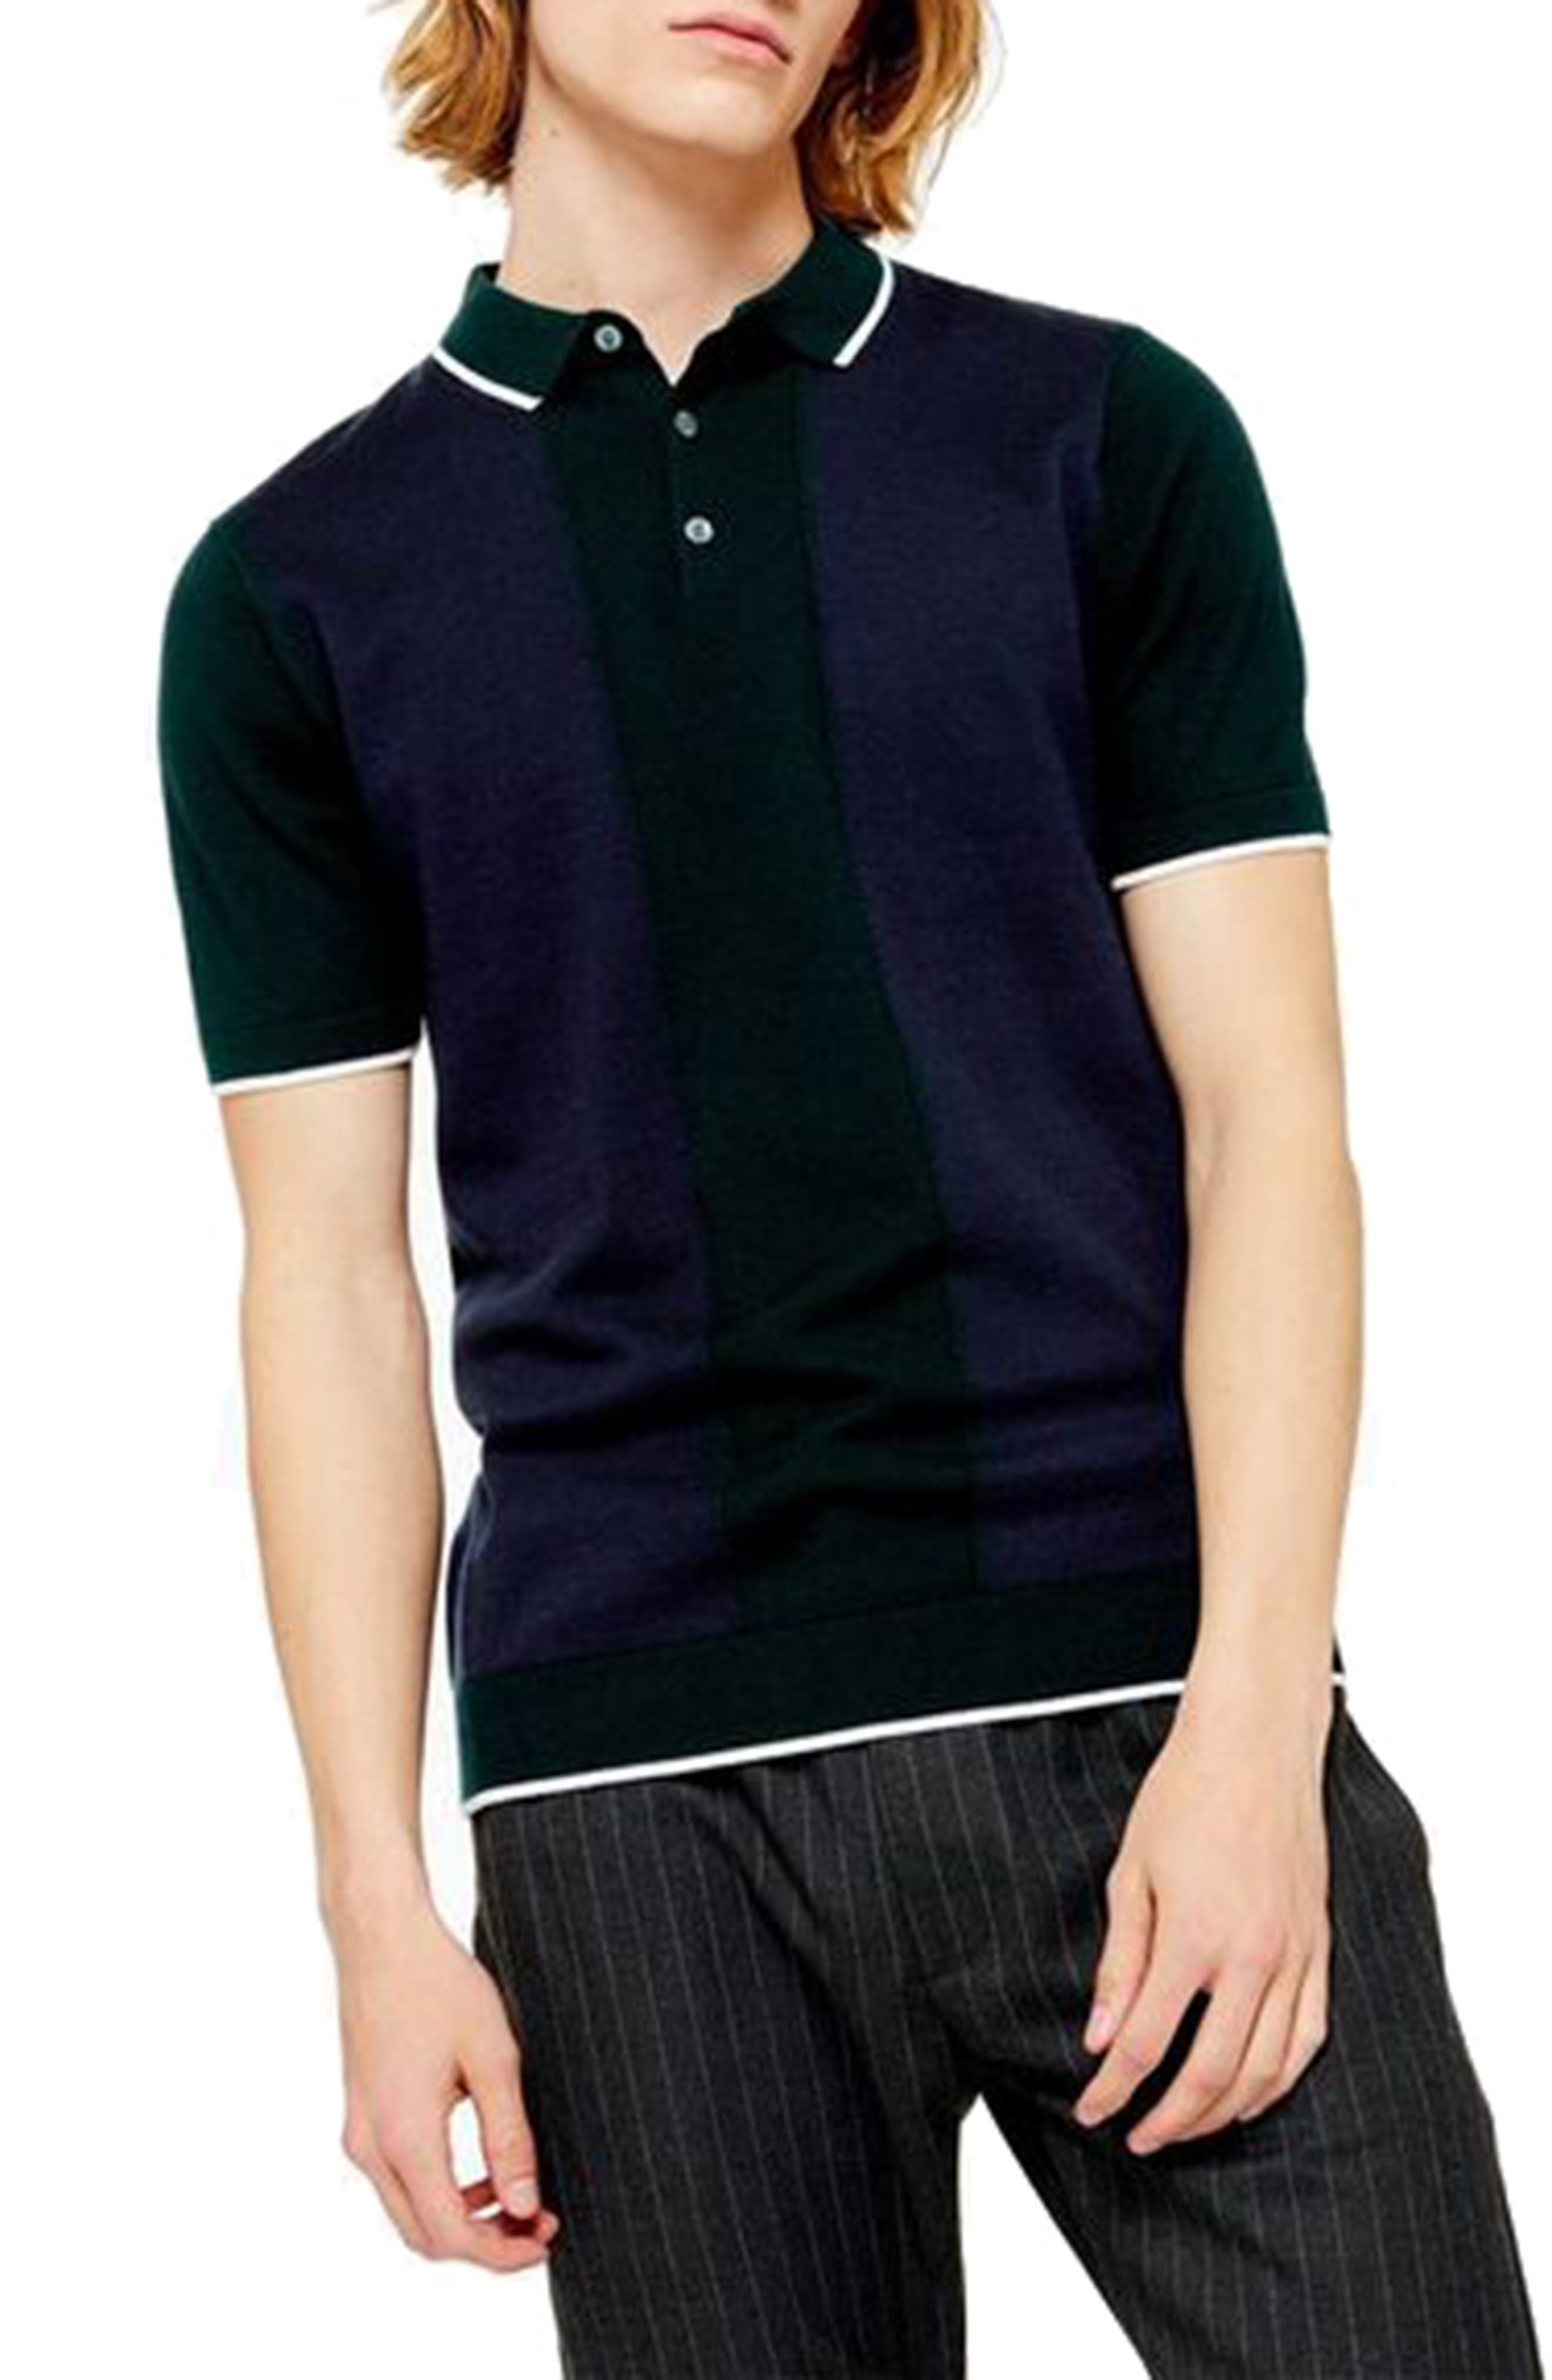 Retro Clothing for Men | Vintage Men's Fashion Mens Topman Colorblock Sweater Polo $22.50 AT vintagedancer.com